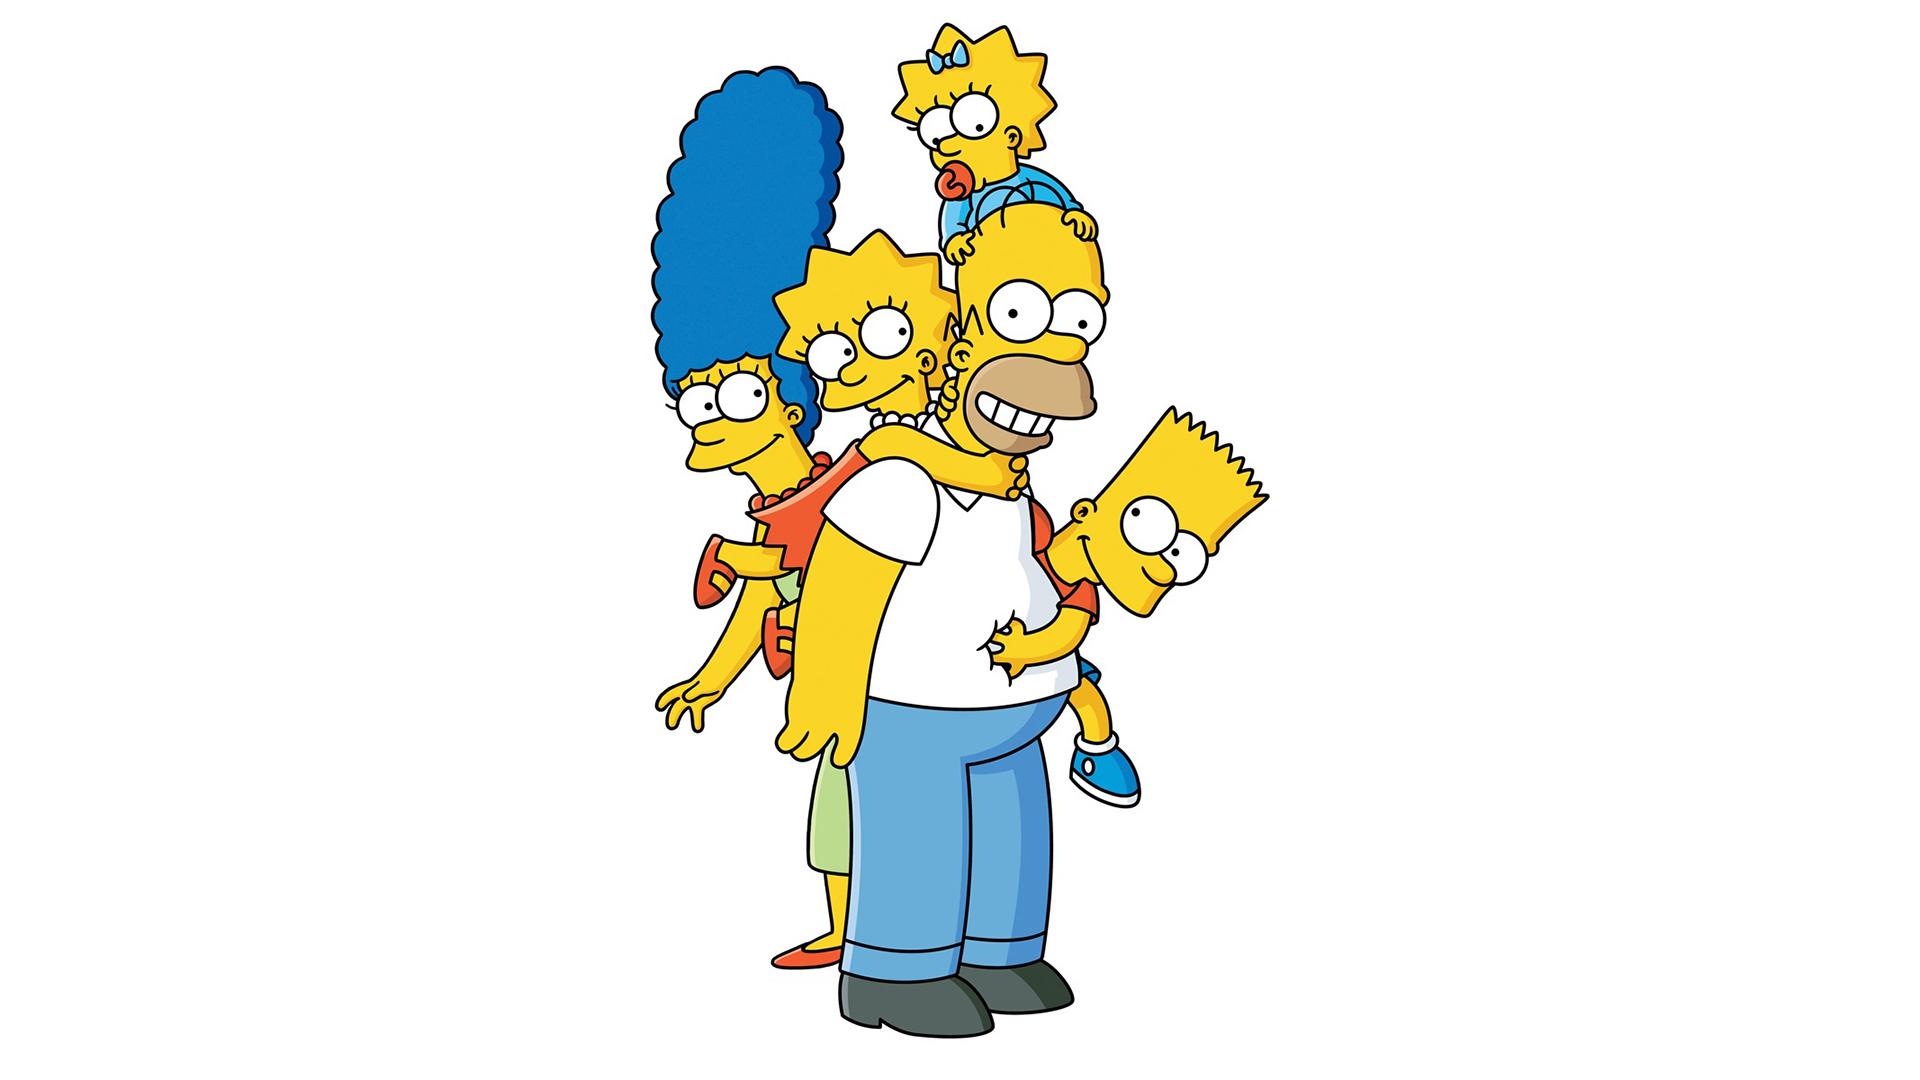 Les simpsons full hd fond d 39 cran and arri re plan for Simpsons wallpaper for bedroom